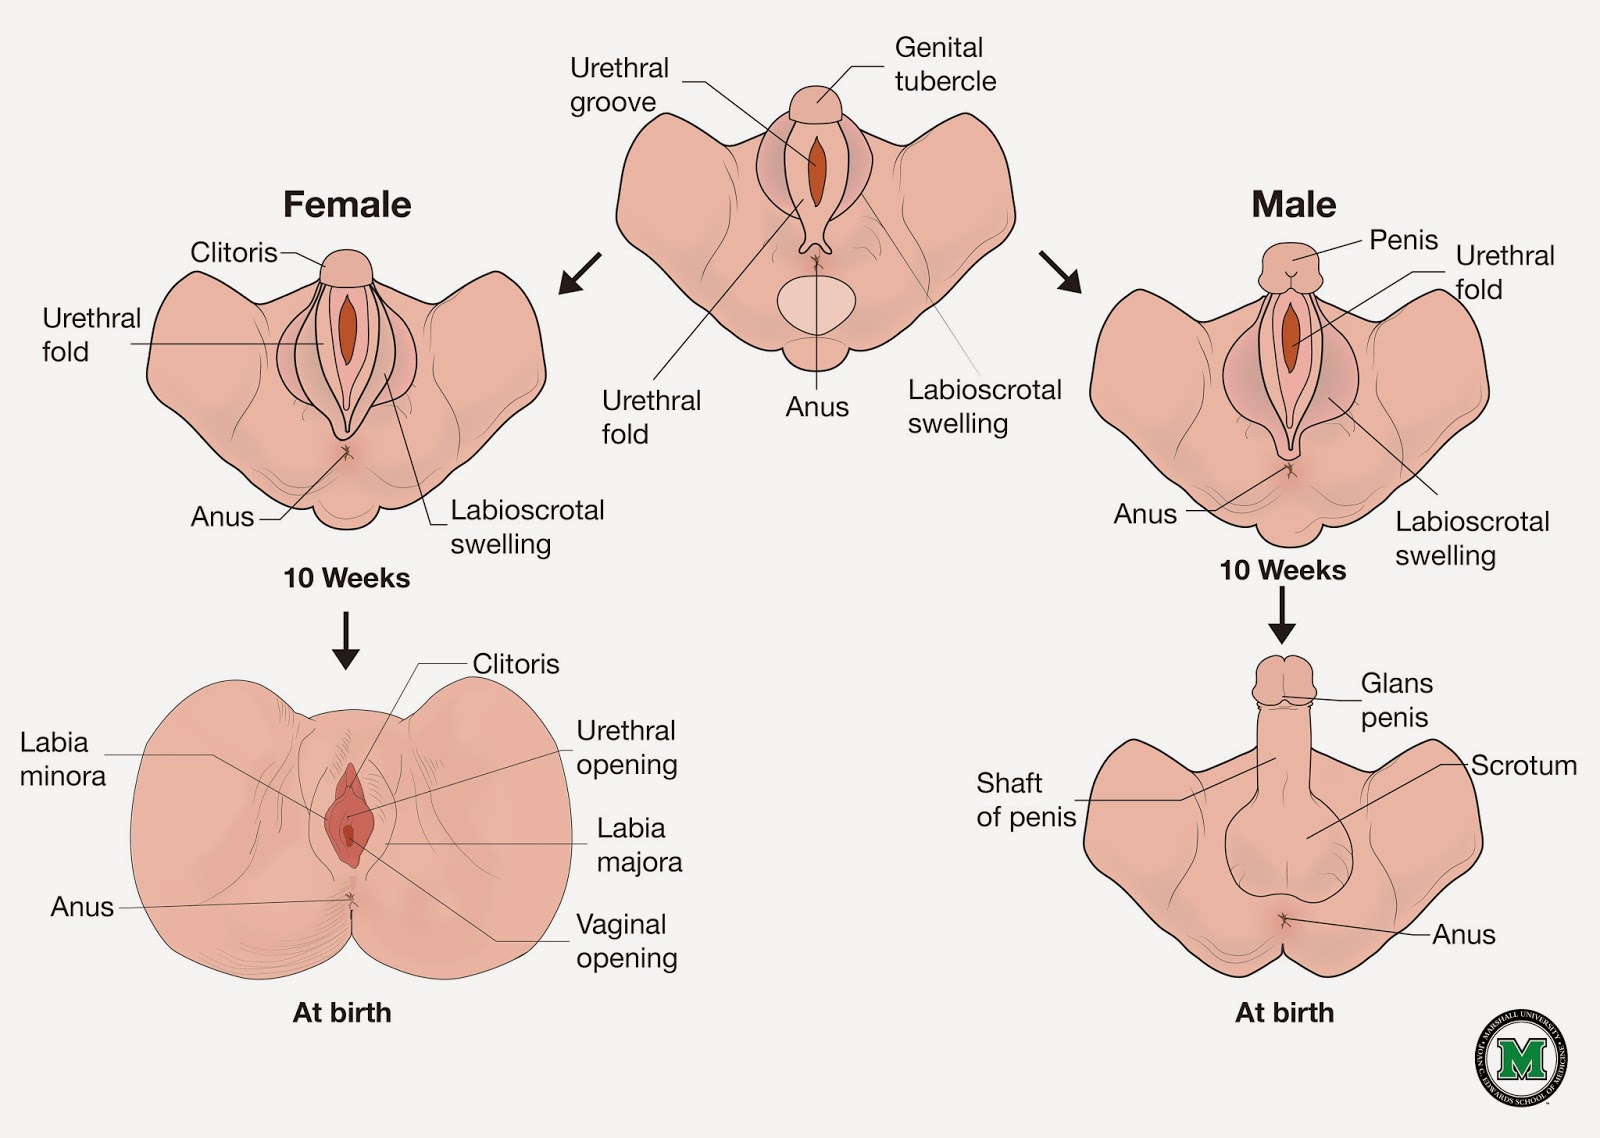 Lujoso Anatomía Genital Niña Inspiración - Imágenes de Anatomía ...